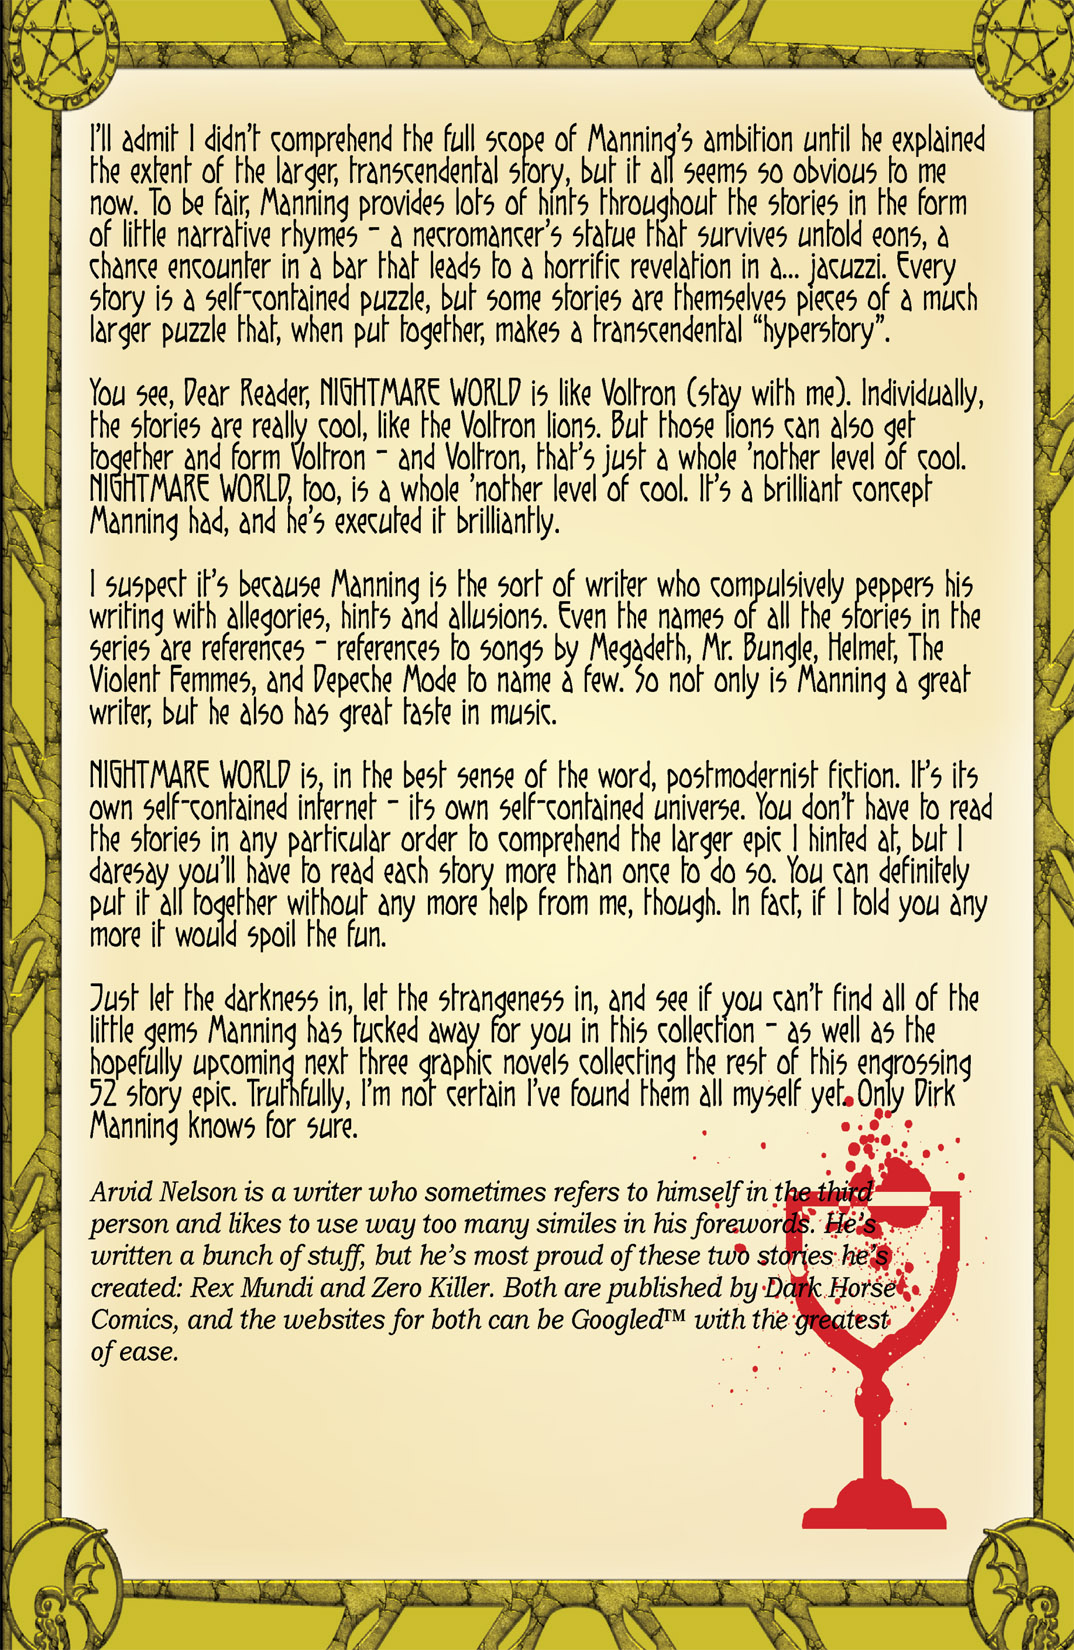 Read online Nightmare World comic -  Issue # Vol. 1 Thirteen Tales of Terror - 6